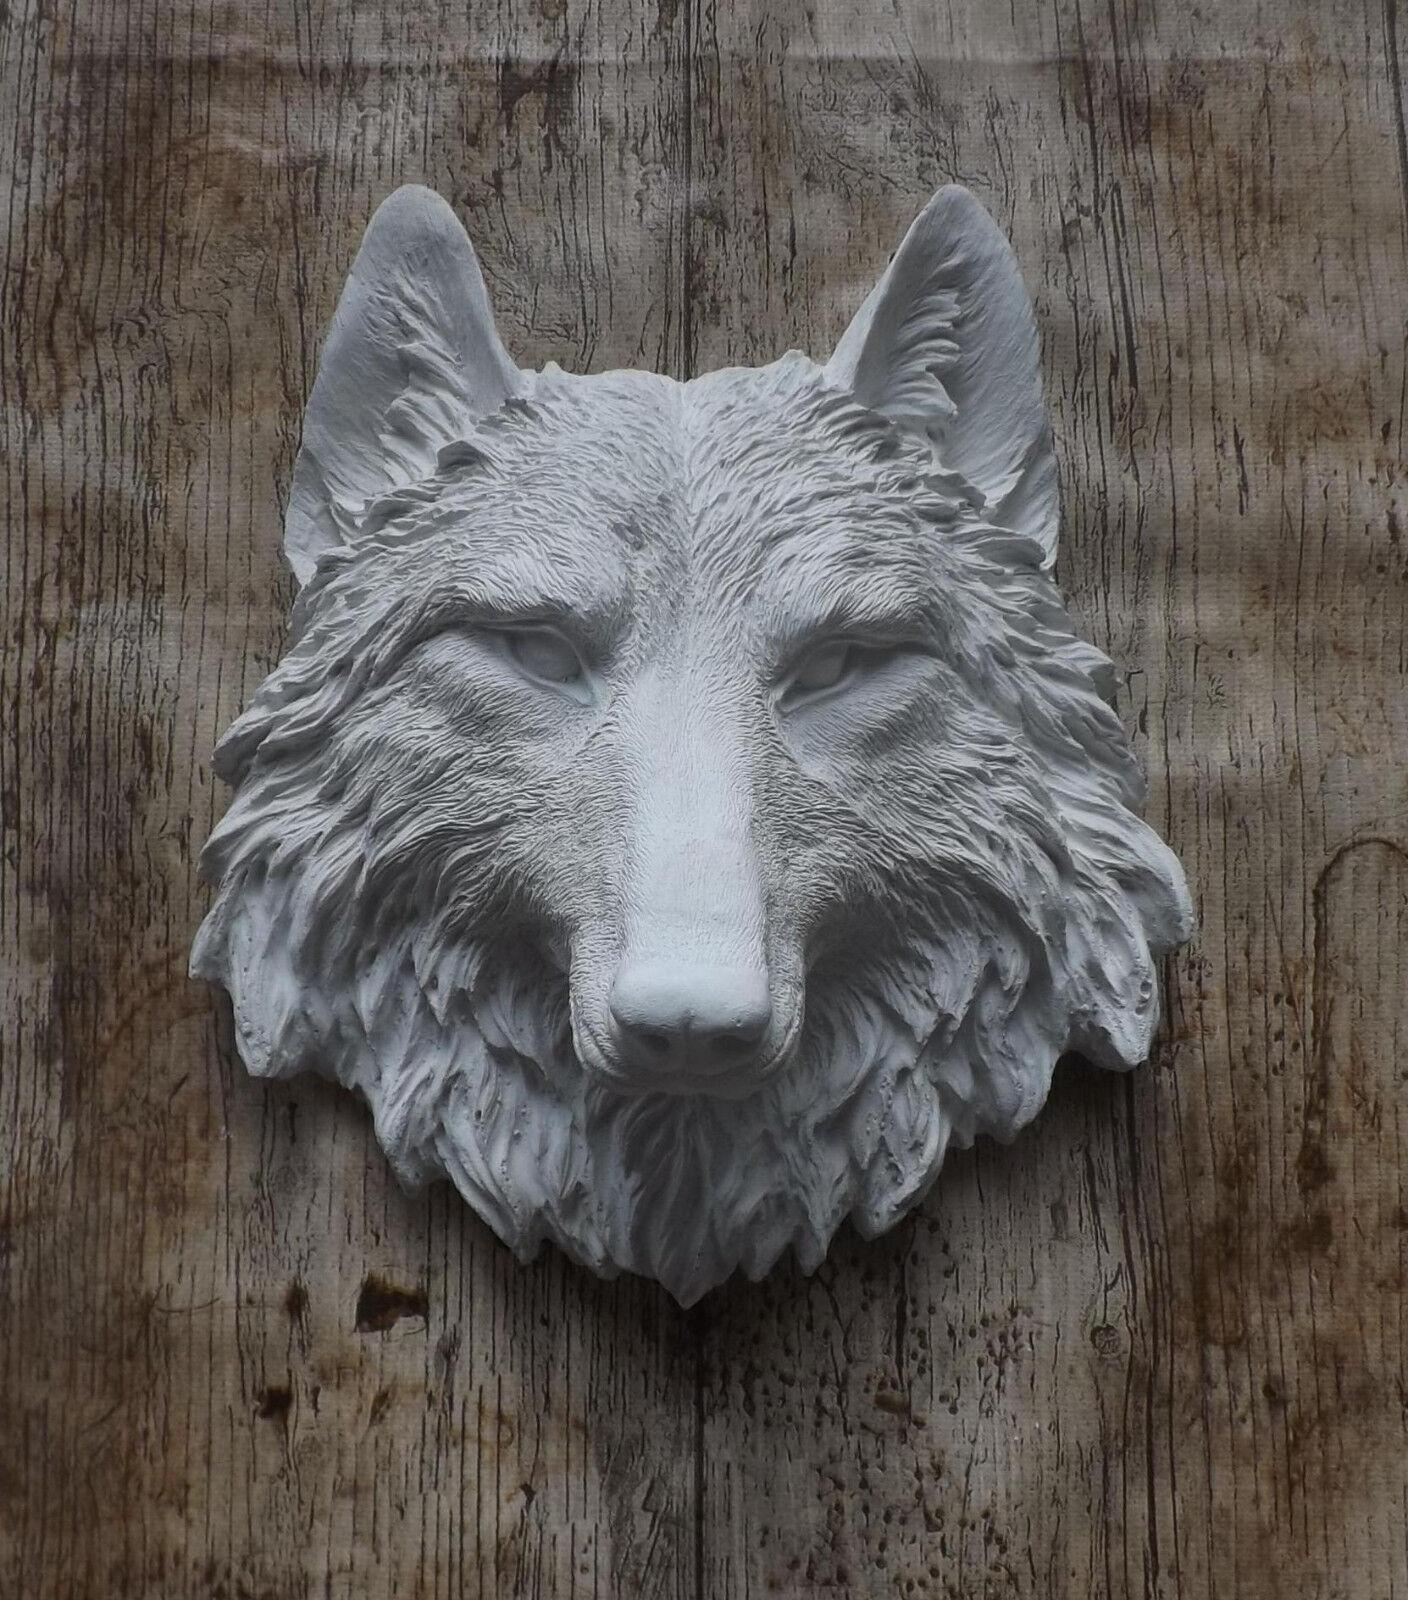 GF01 Wolf Steinfigur Gartenfiguren Relief Wolfskopf Gartendeko Wandrelief